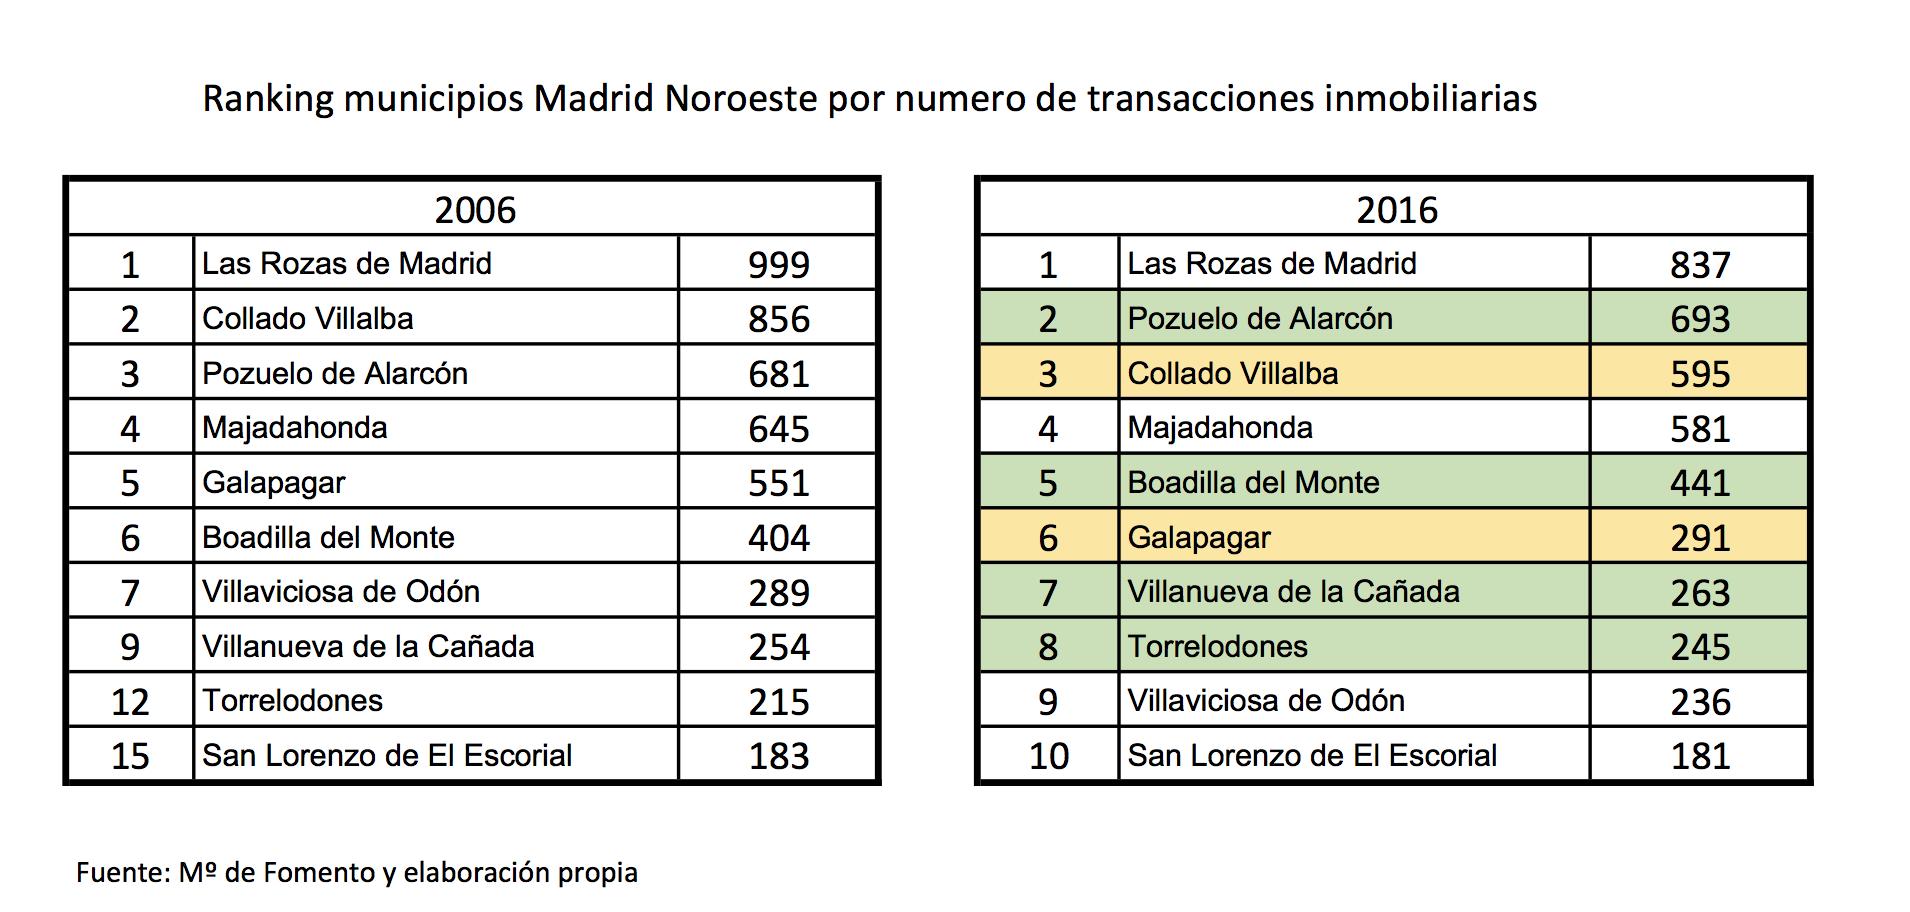 Ranking municipios Madrid Noroeste por numero de transacciones inmobiliarias